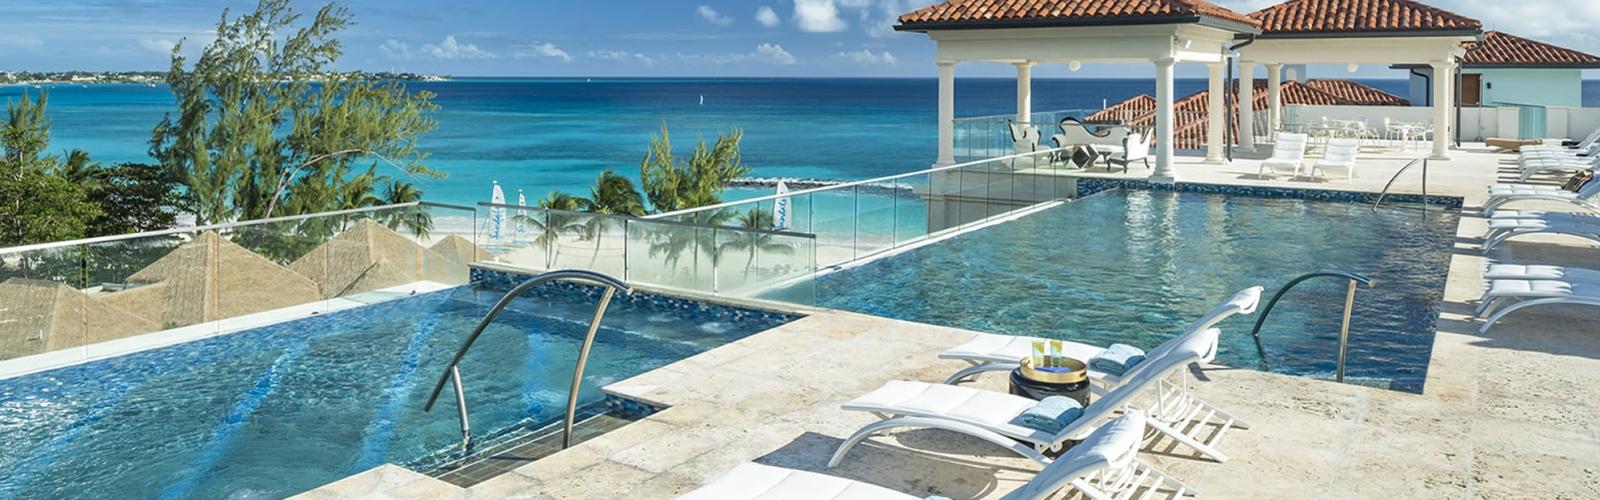 Sandals Amp Beaches Holidays 2019 2020 Sandals Resorts